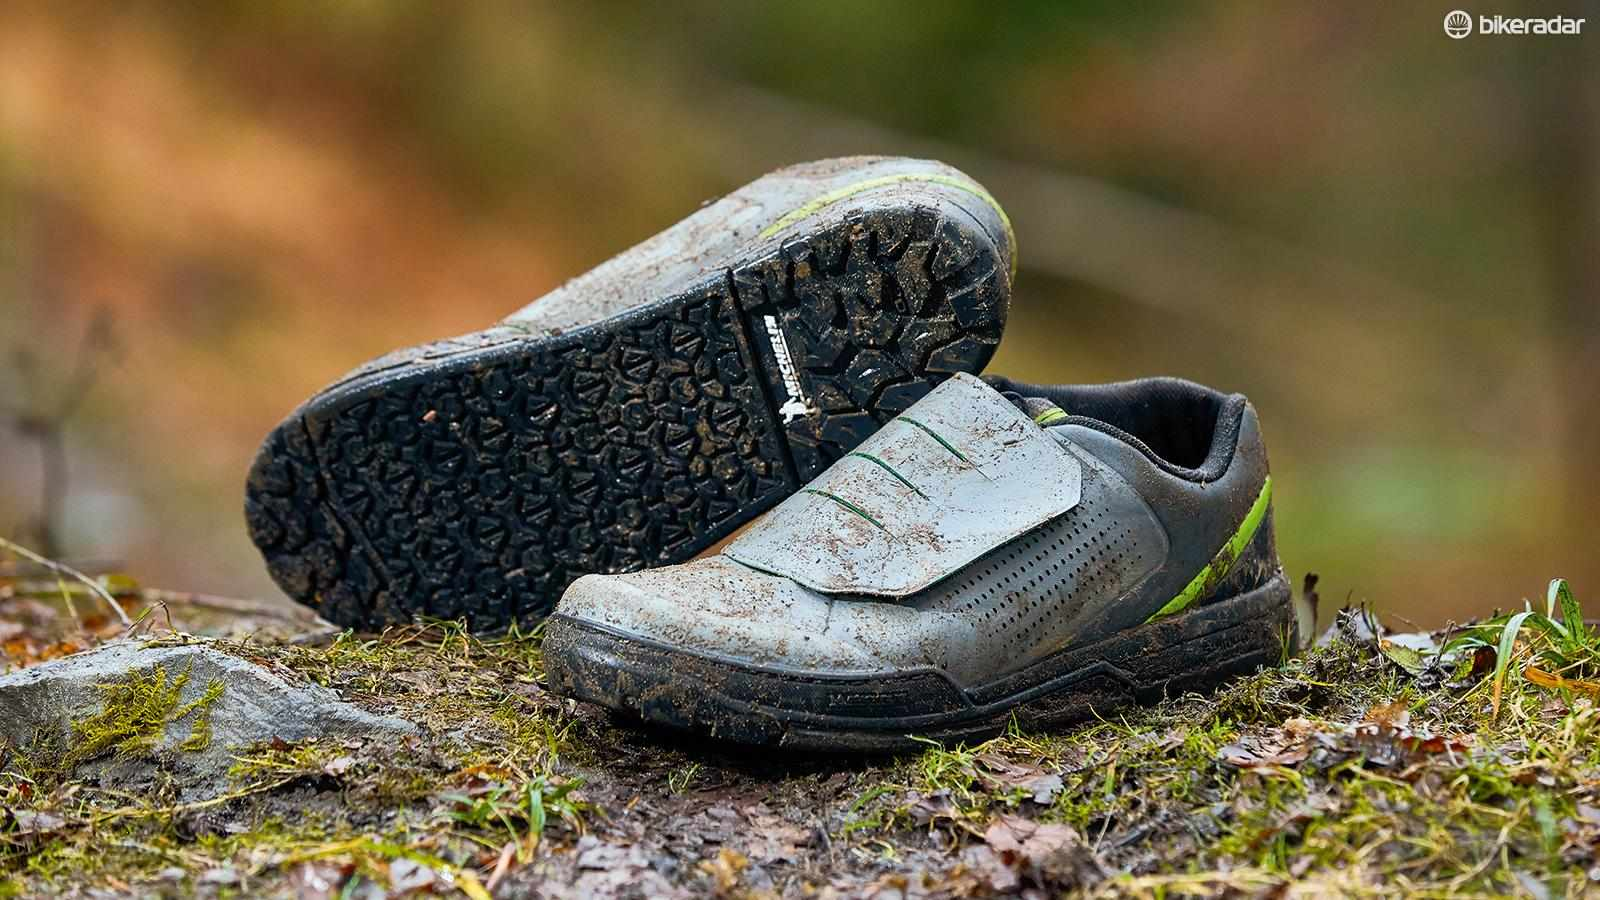 Shimano's GR9 MTB shoes